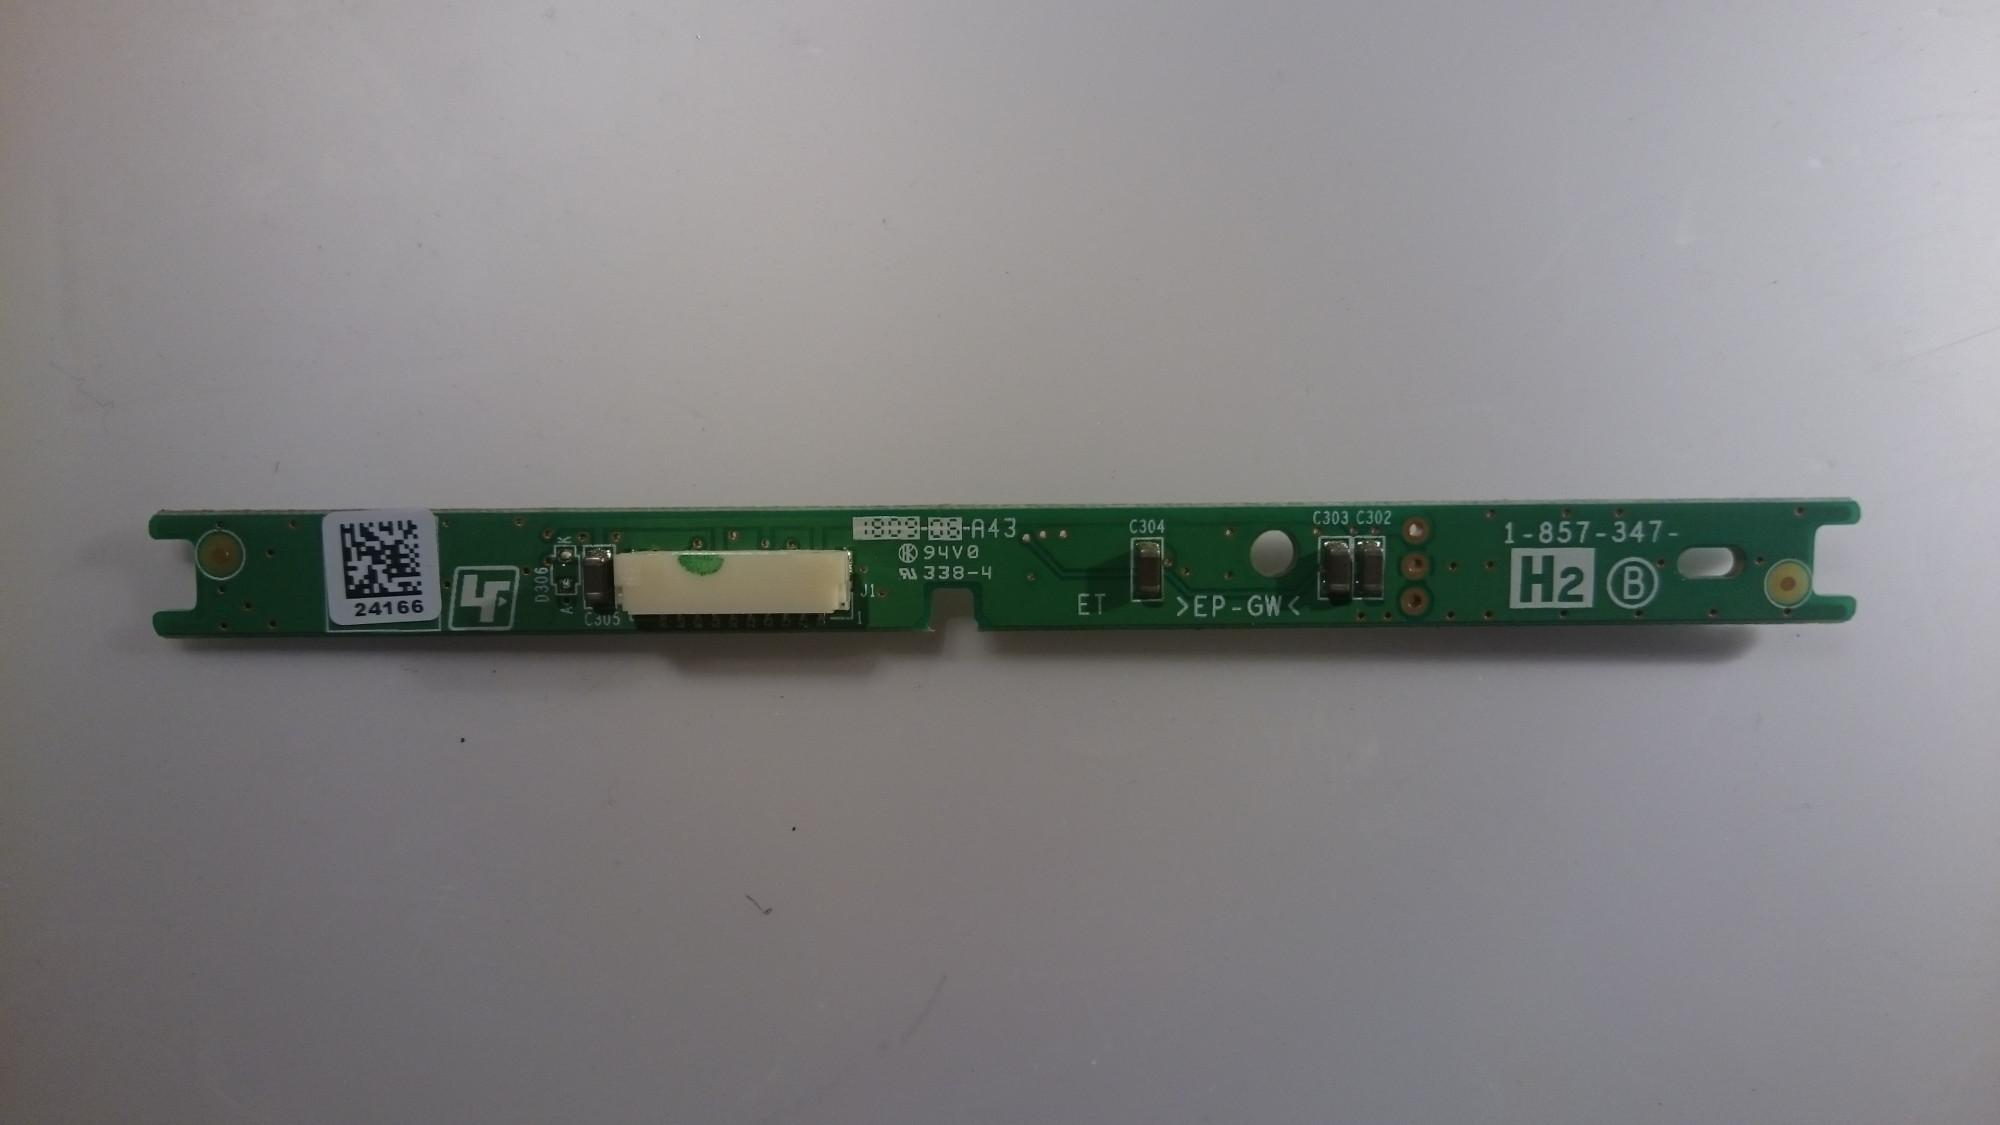 1 857 347 B Ir Remote Control Sensor For Sony Kdl 26s5500 Checking